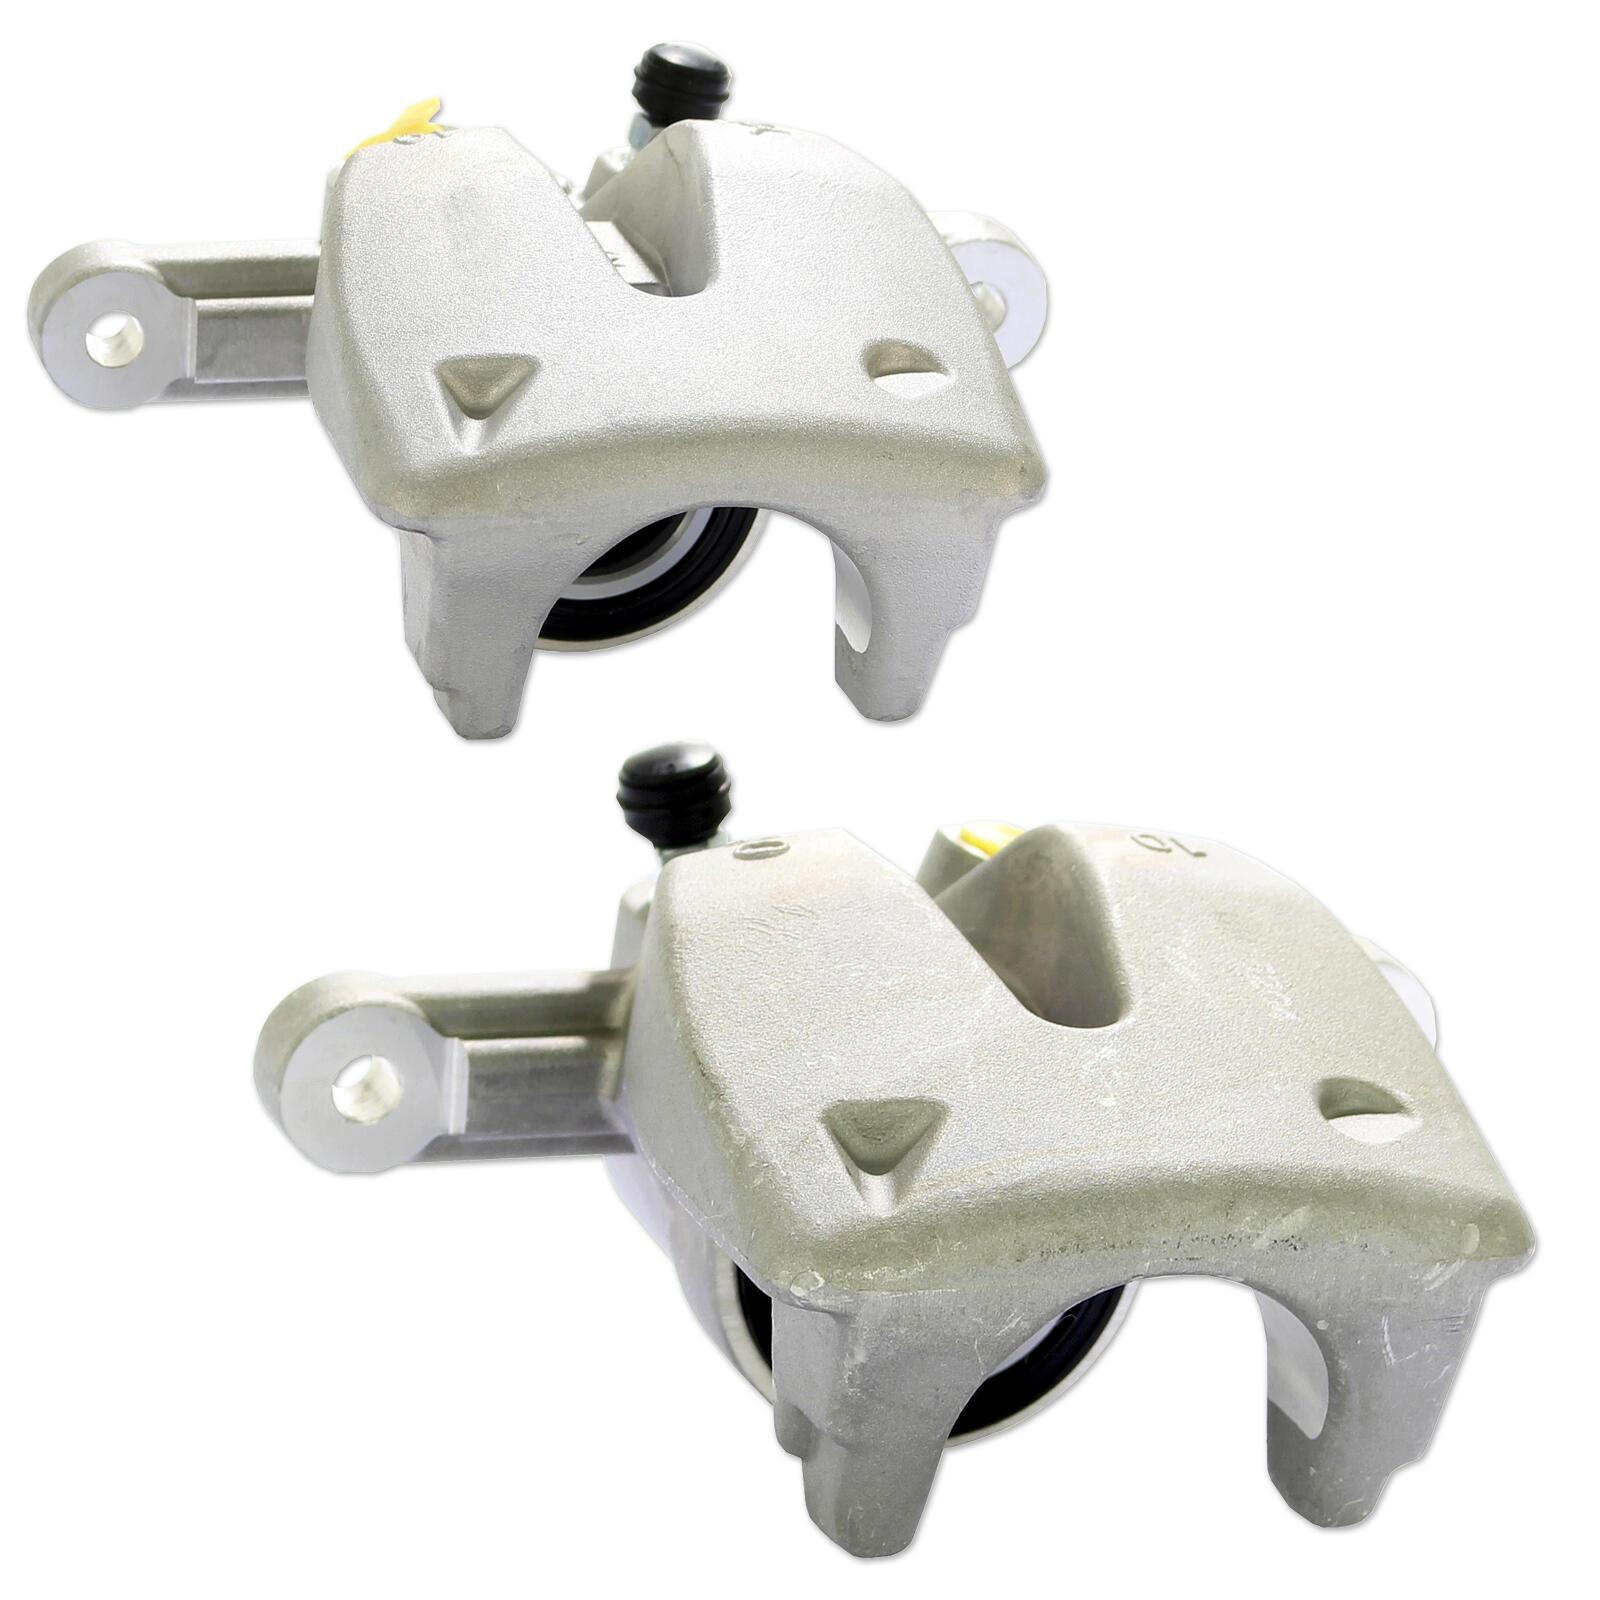 2 Bremssättel Bremssattel HINTEN links /& rechts für Toyota Avensis Kombi Corolla